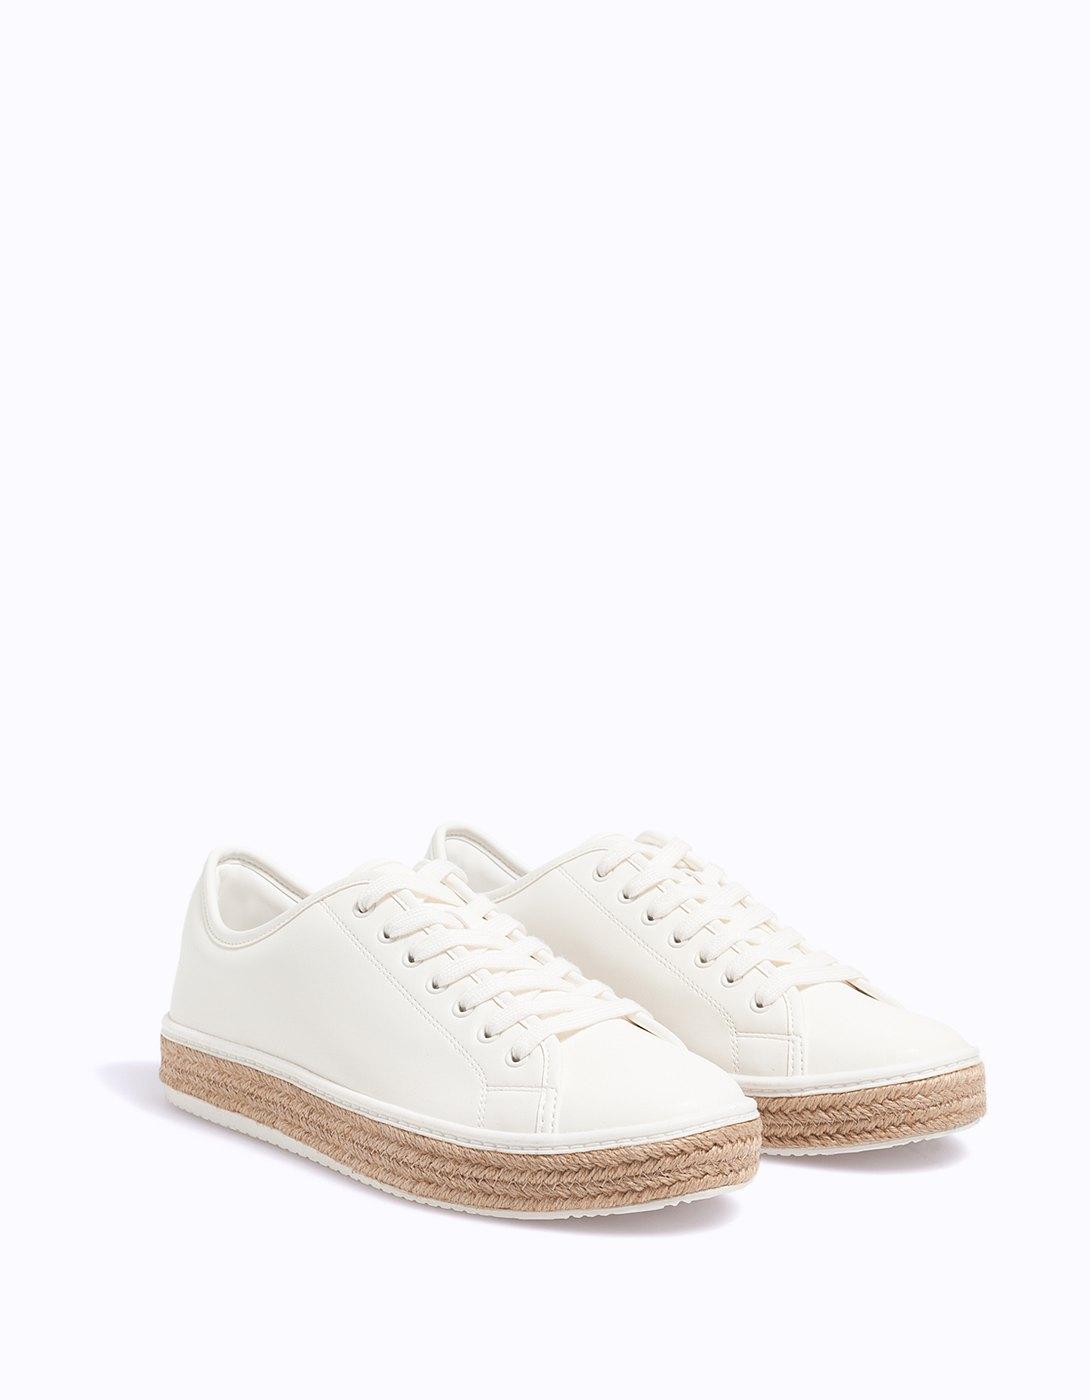 Stradivarius White Sneakers